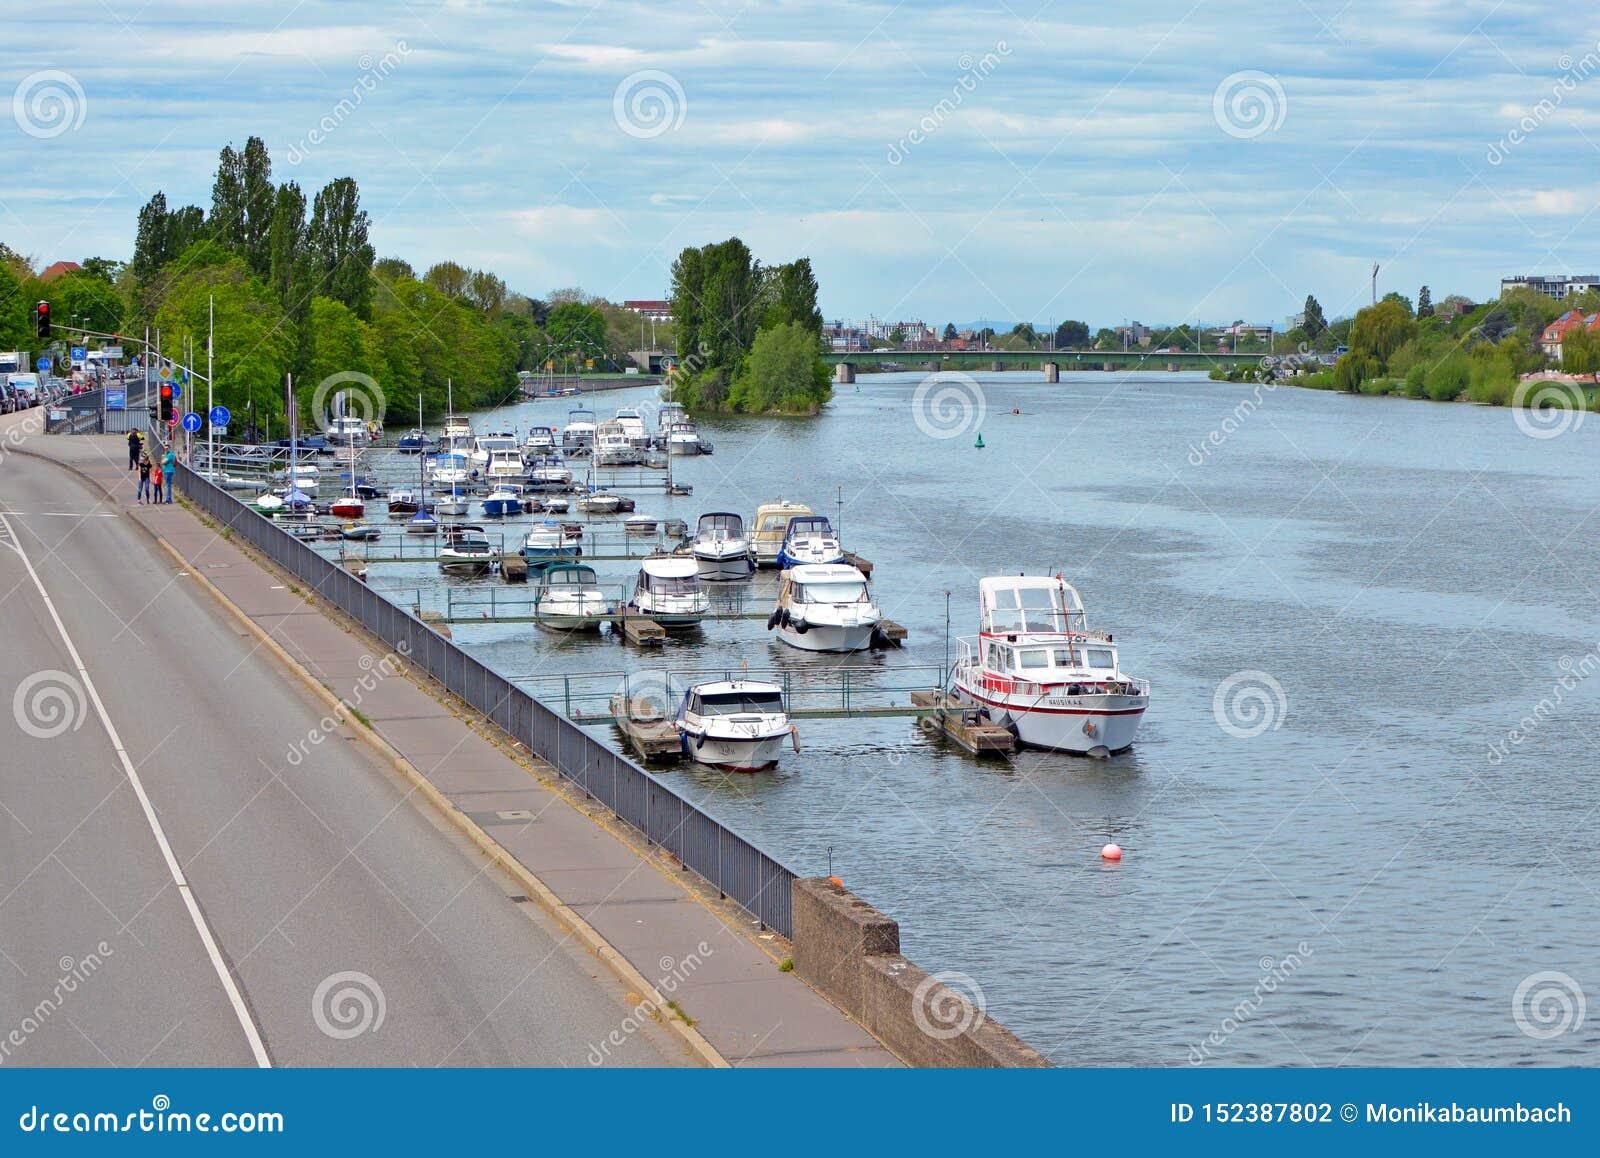 Lugar de aterrissagem para barcos privados pequenos no mais baixo banco de rio de Neckar dentro